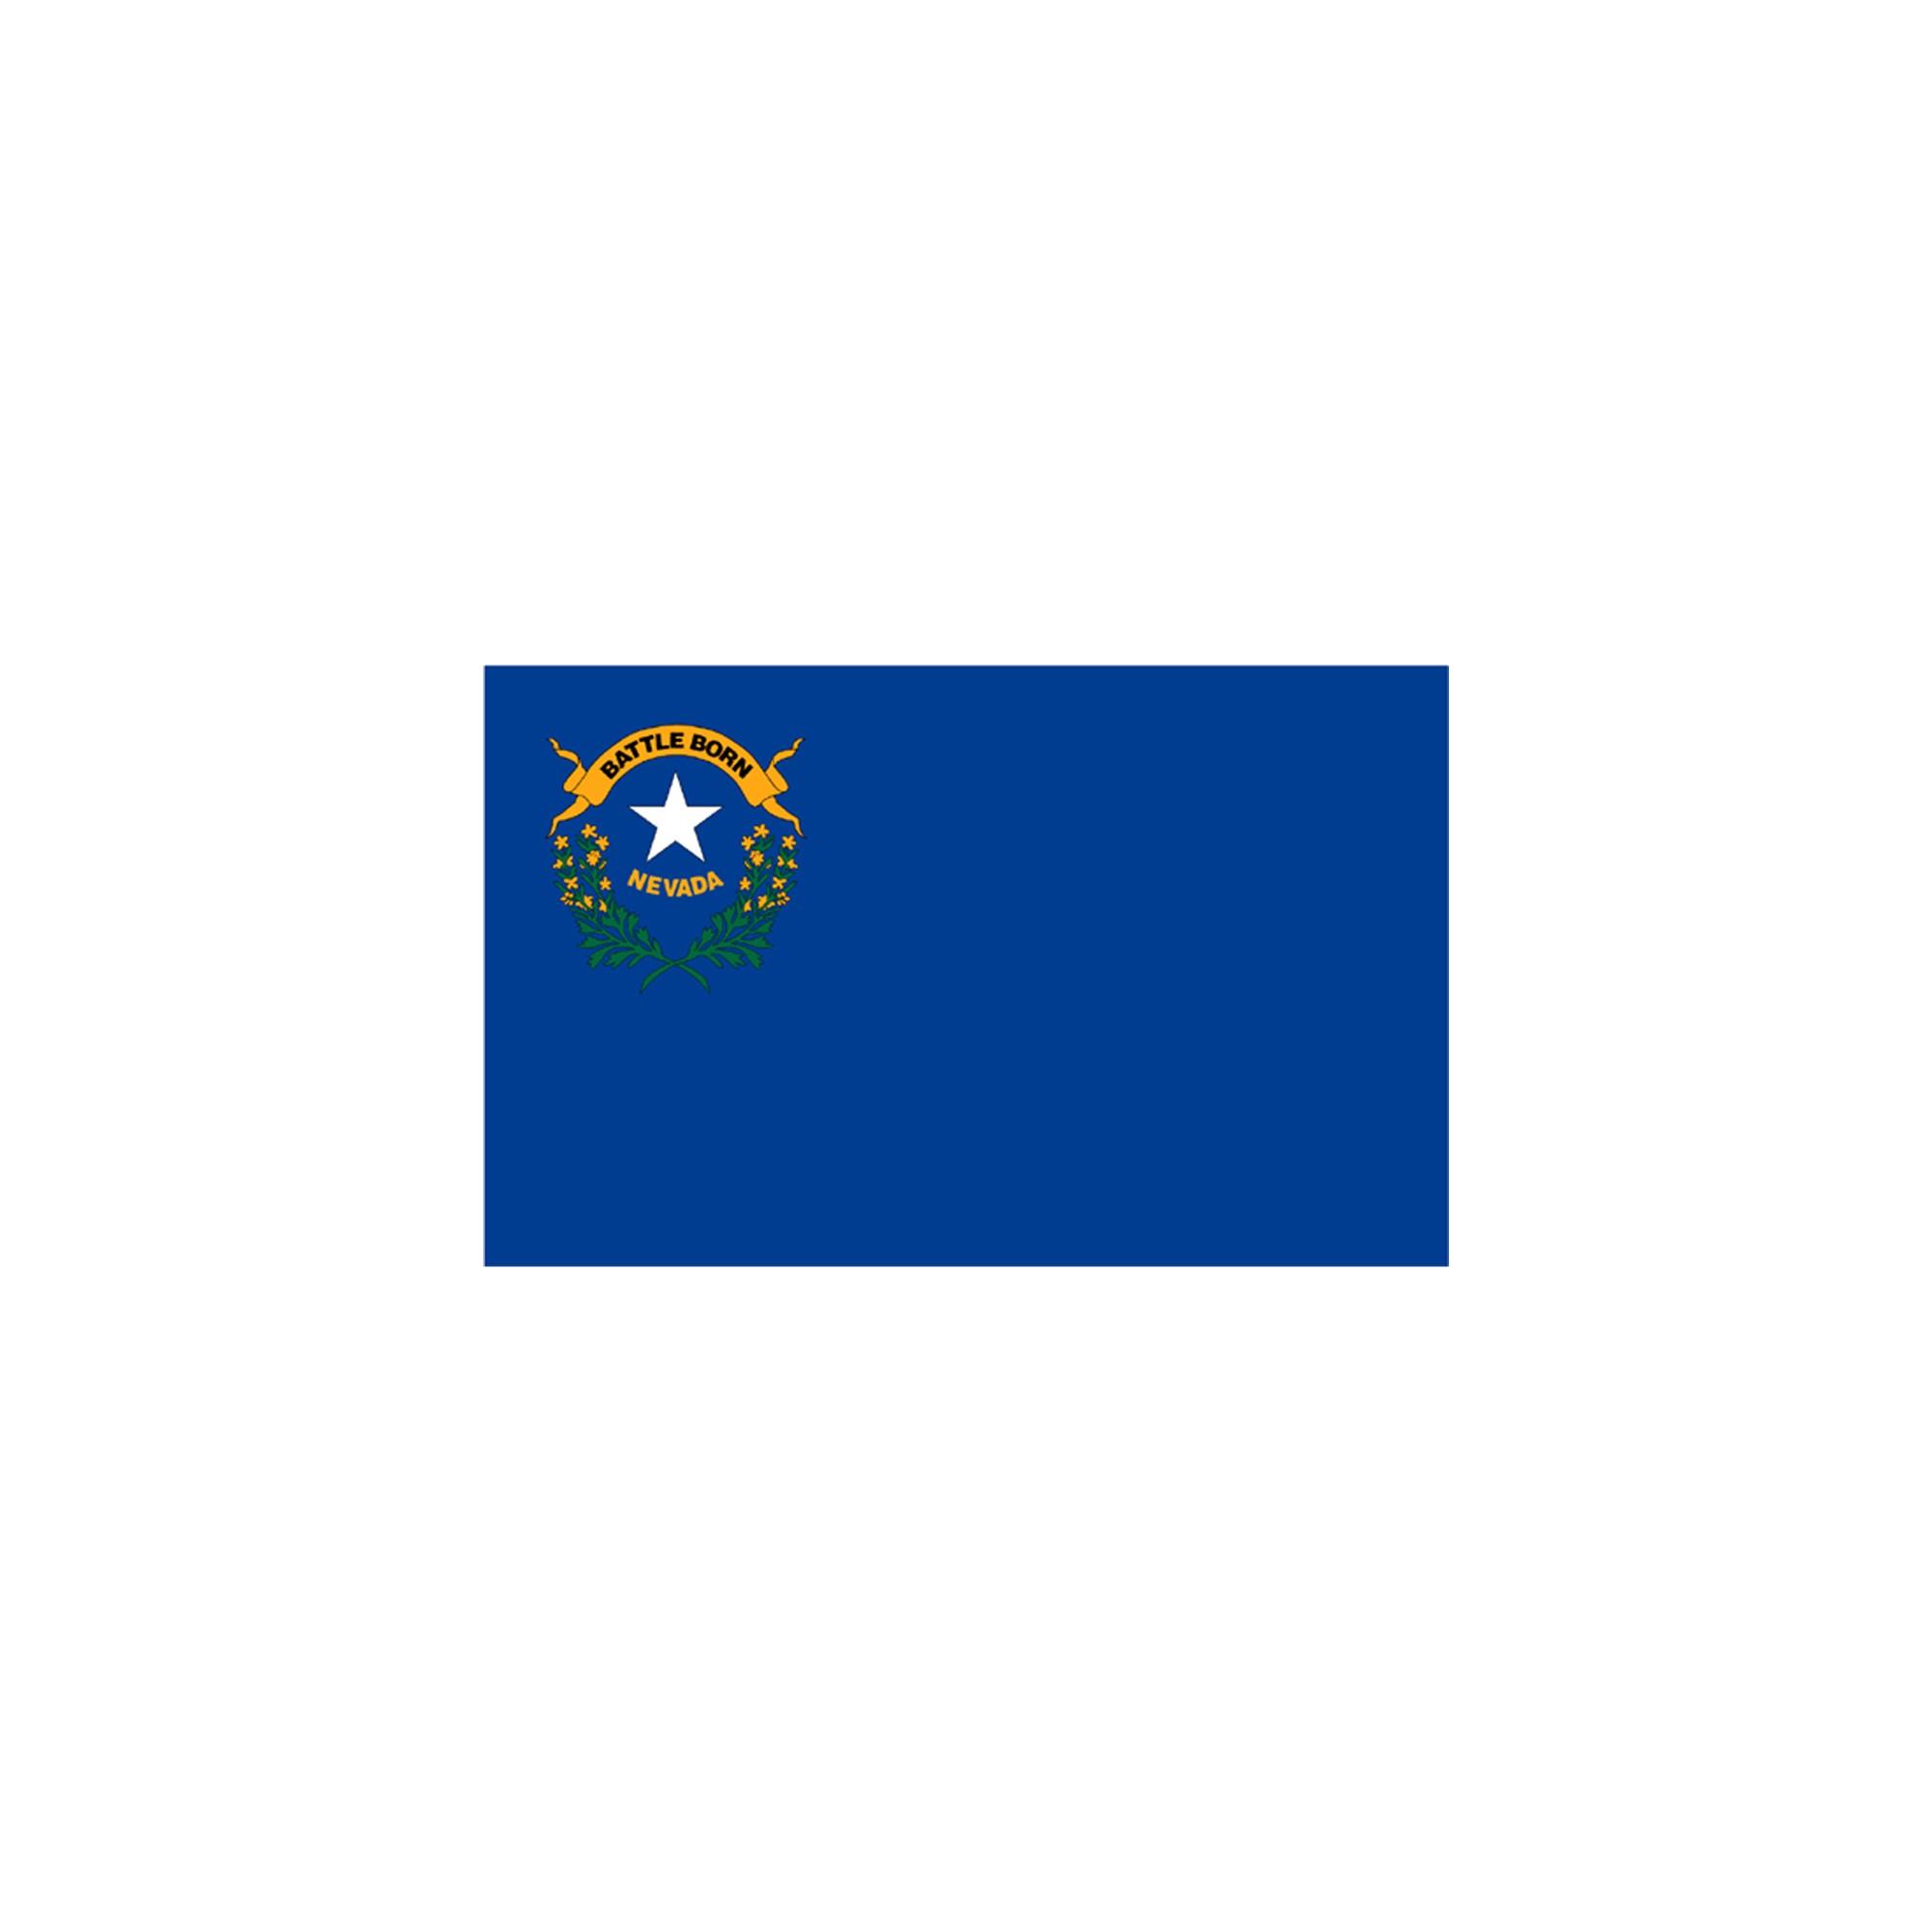 Halloween Nevada State Flag - 3' x 5'